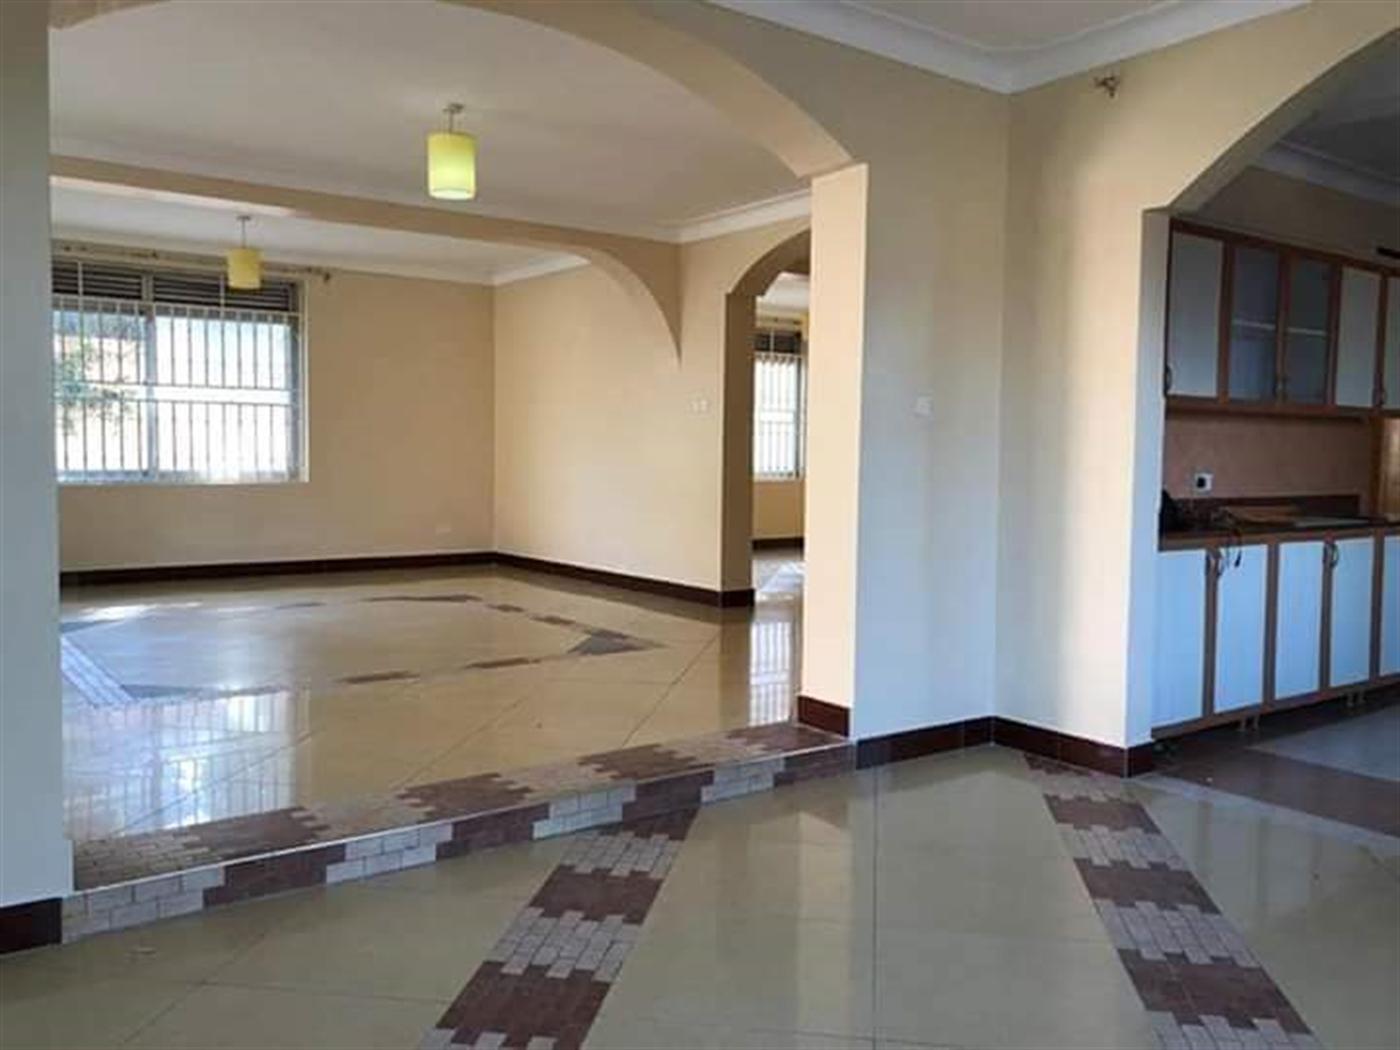 Storyed house for rent in Muyenga Kampala